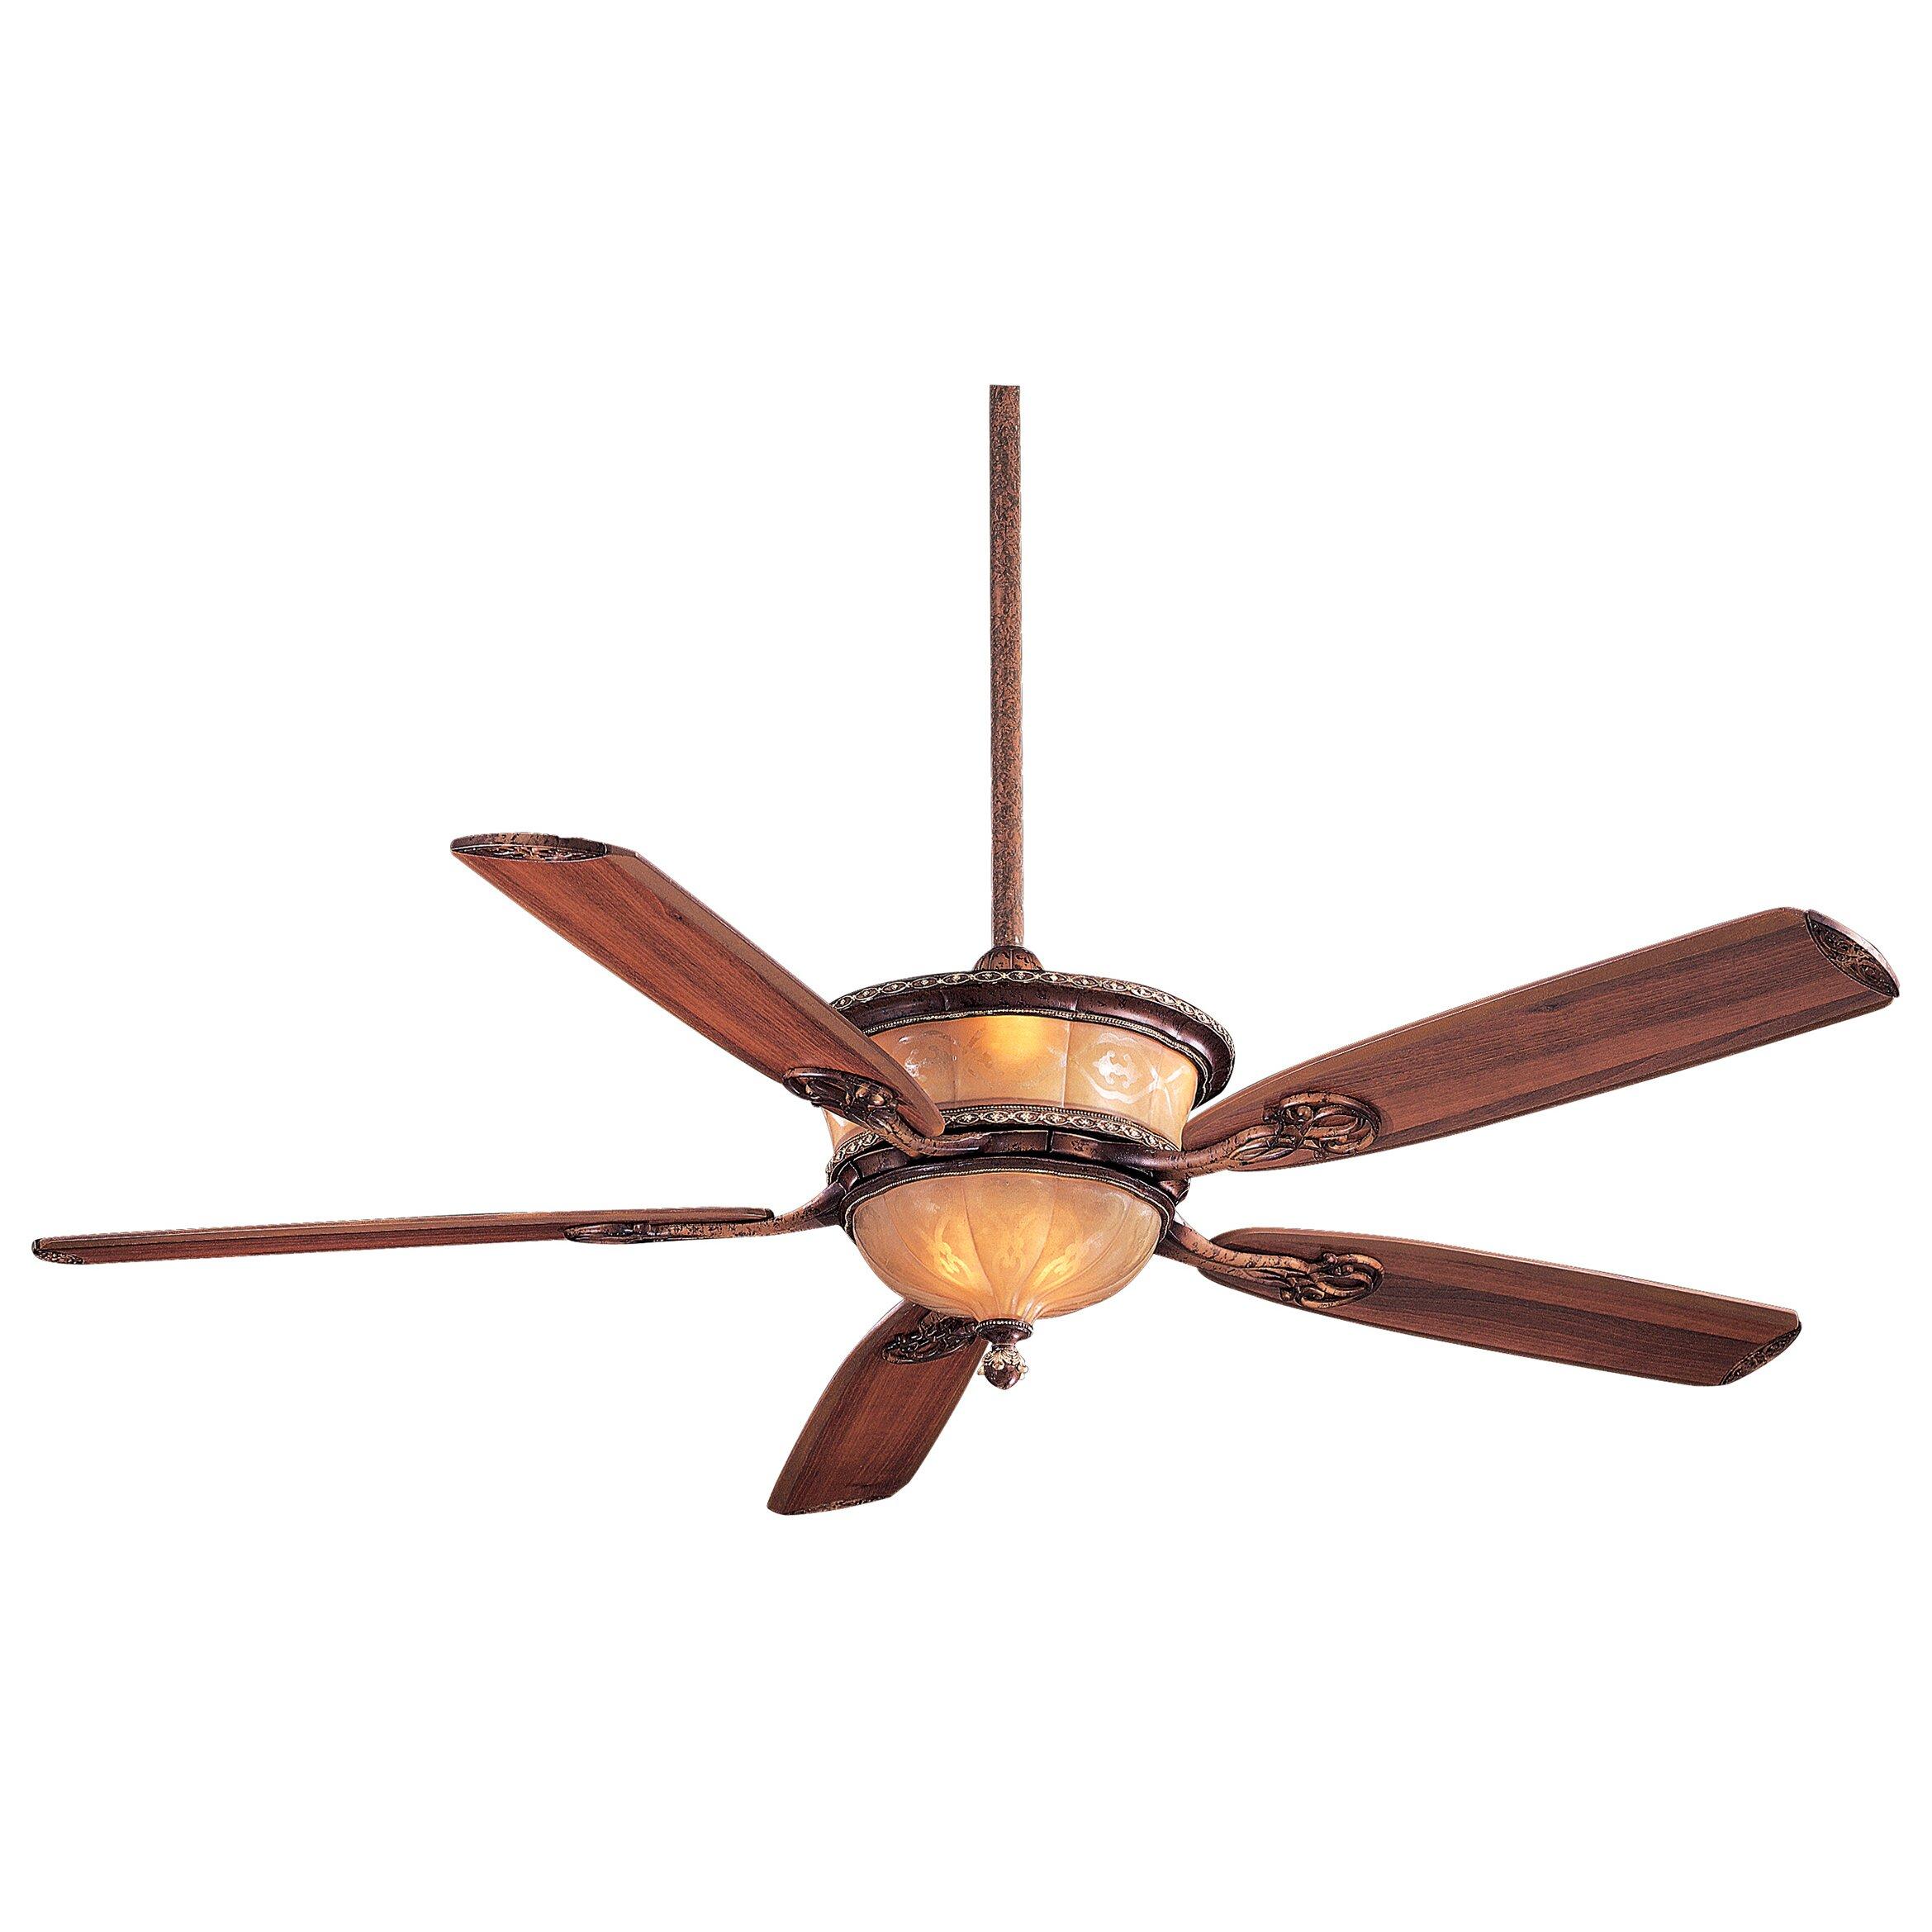 "Ceiling Fan Minka Aire: Minka Aire 60"" Hearst Castle Santa Lucia 5 Blade Ceiling"